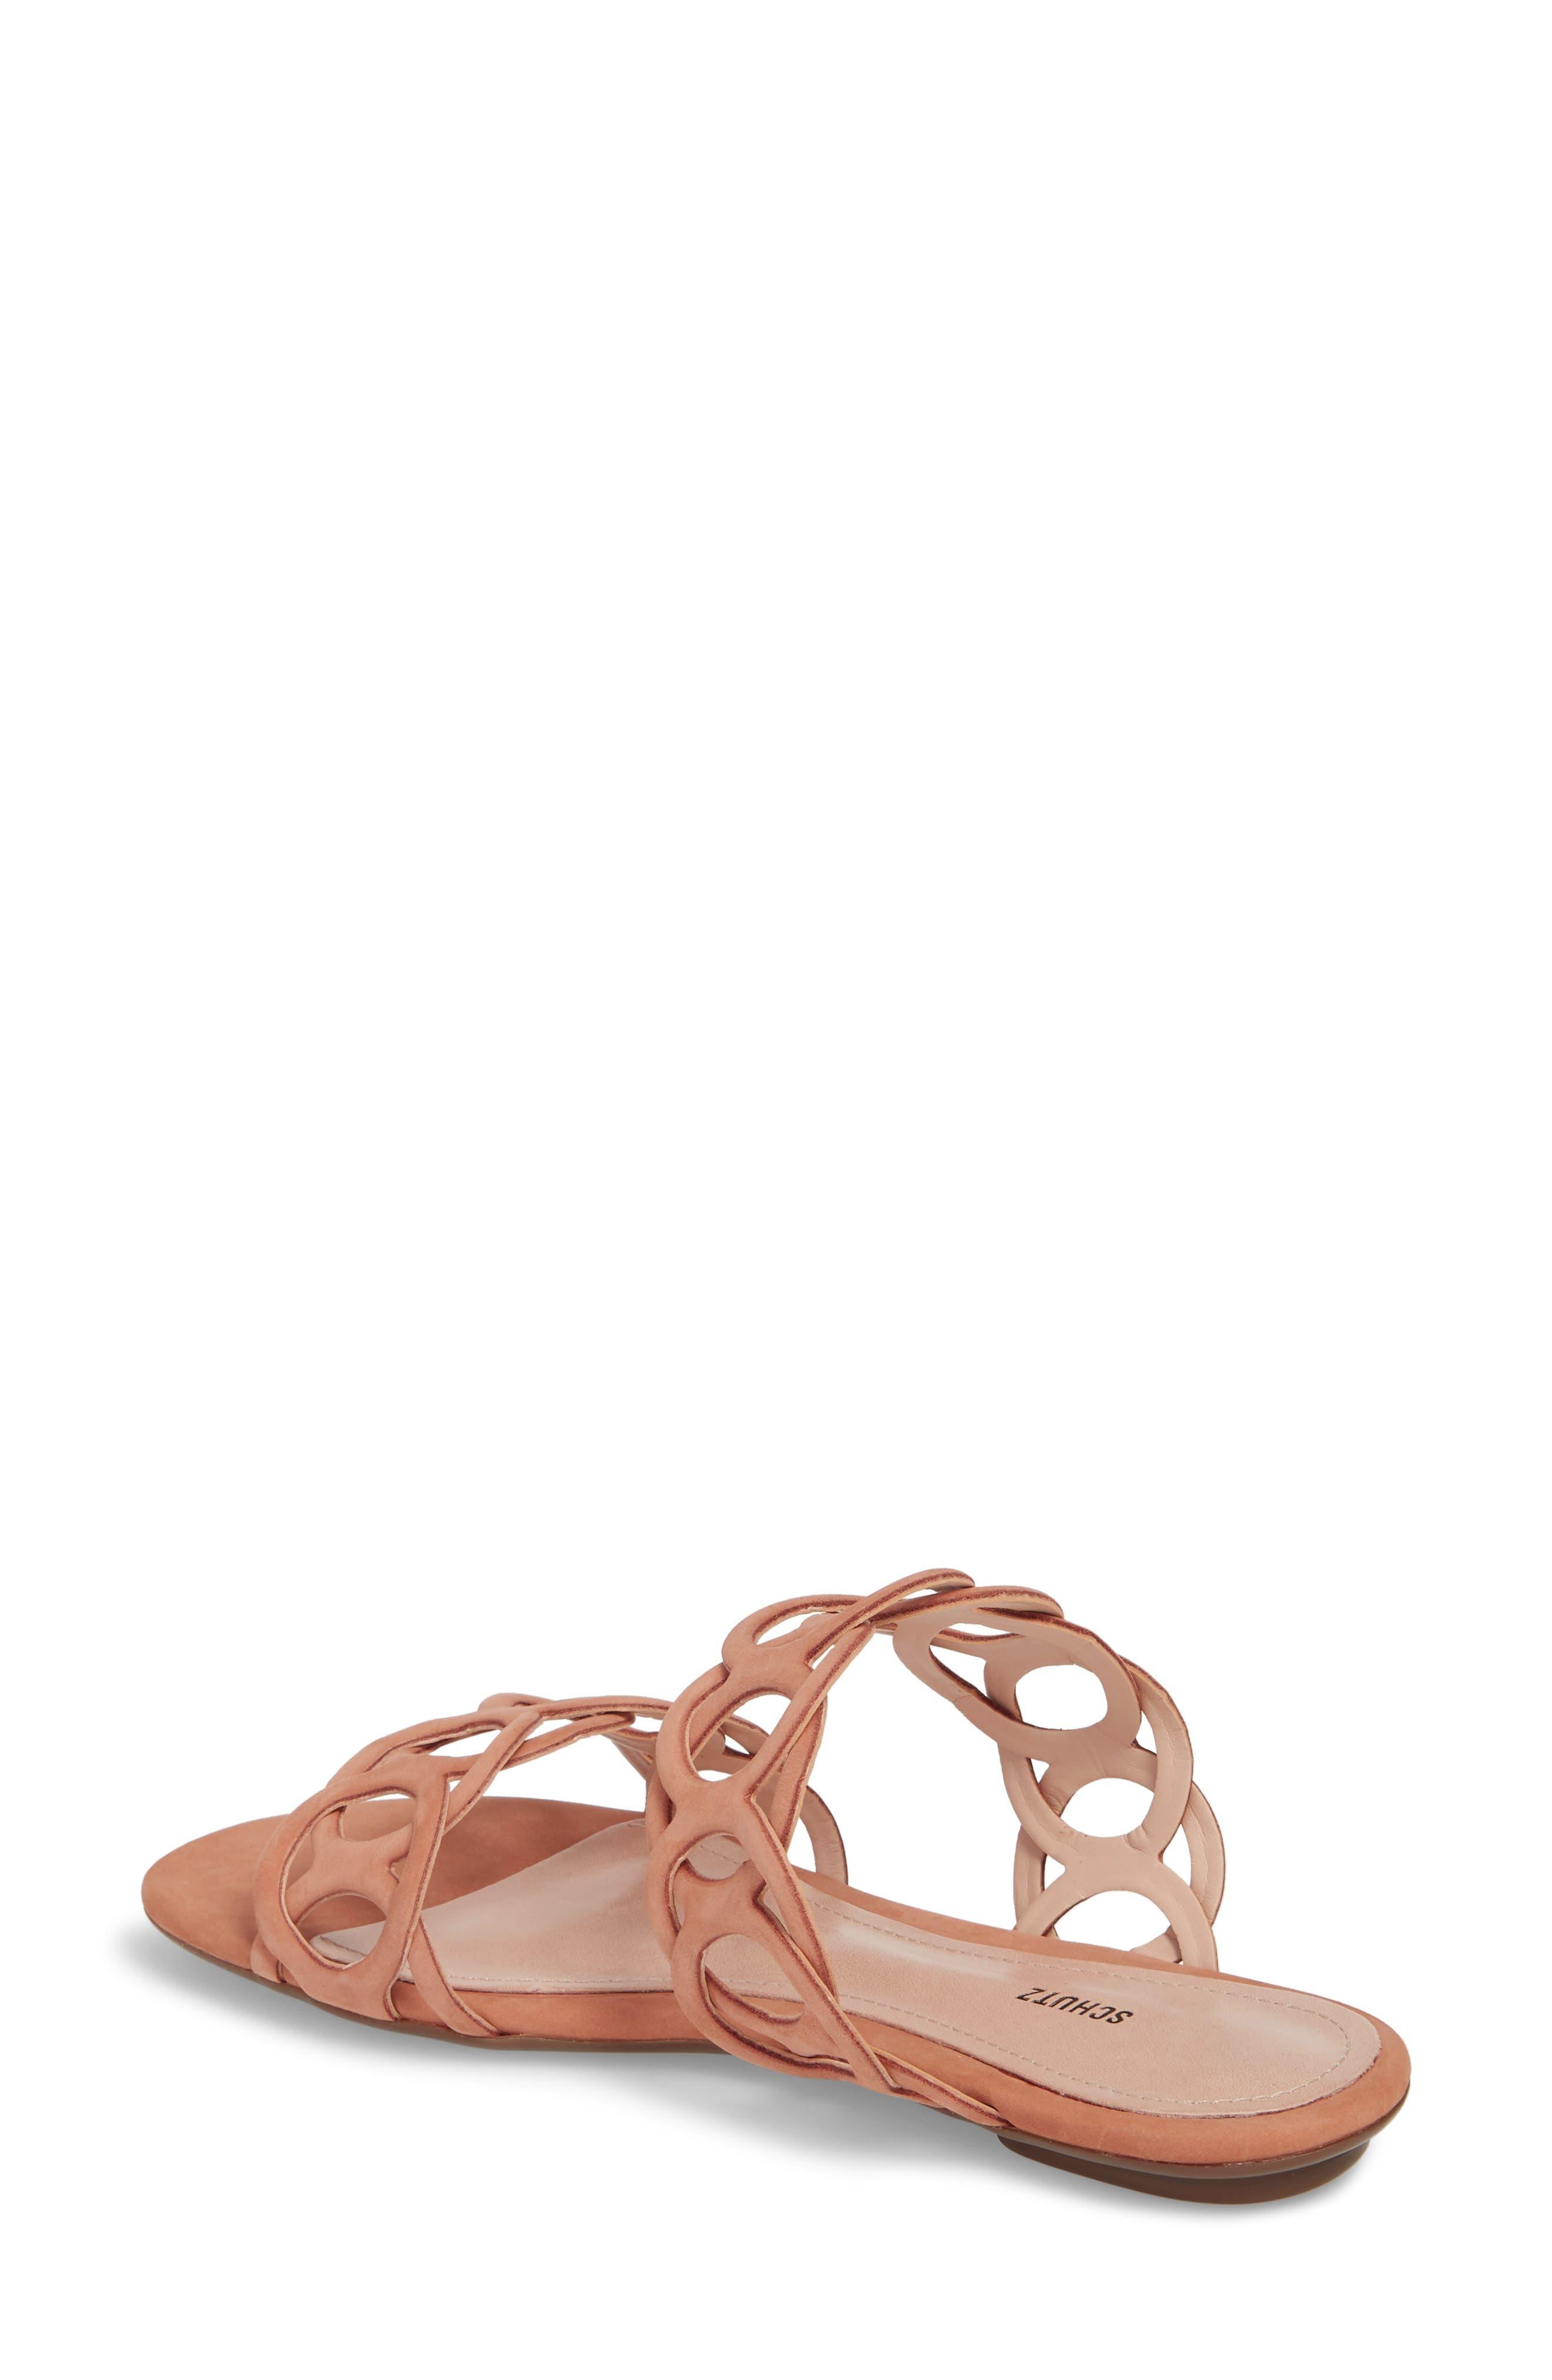 Yaslin Slide Sandal,                             Alternate thumbnail 2, color,                             Toasted Nut Leather